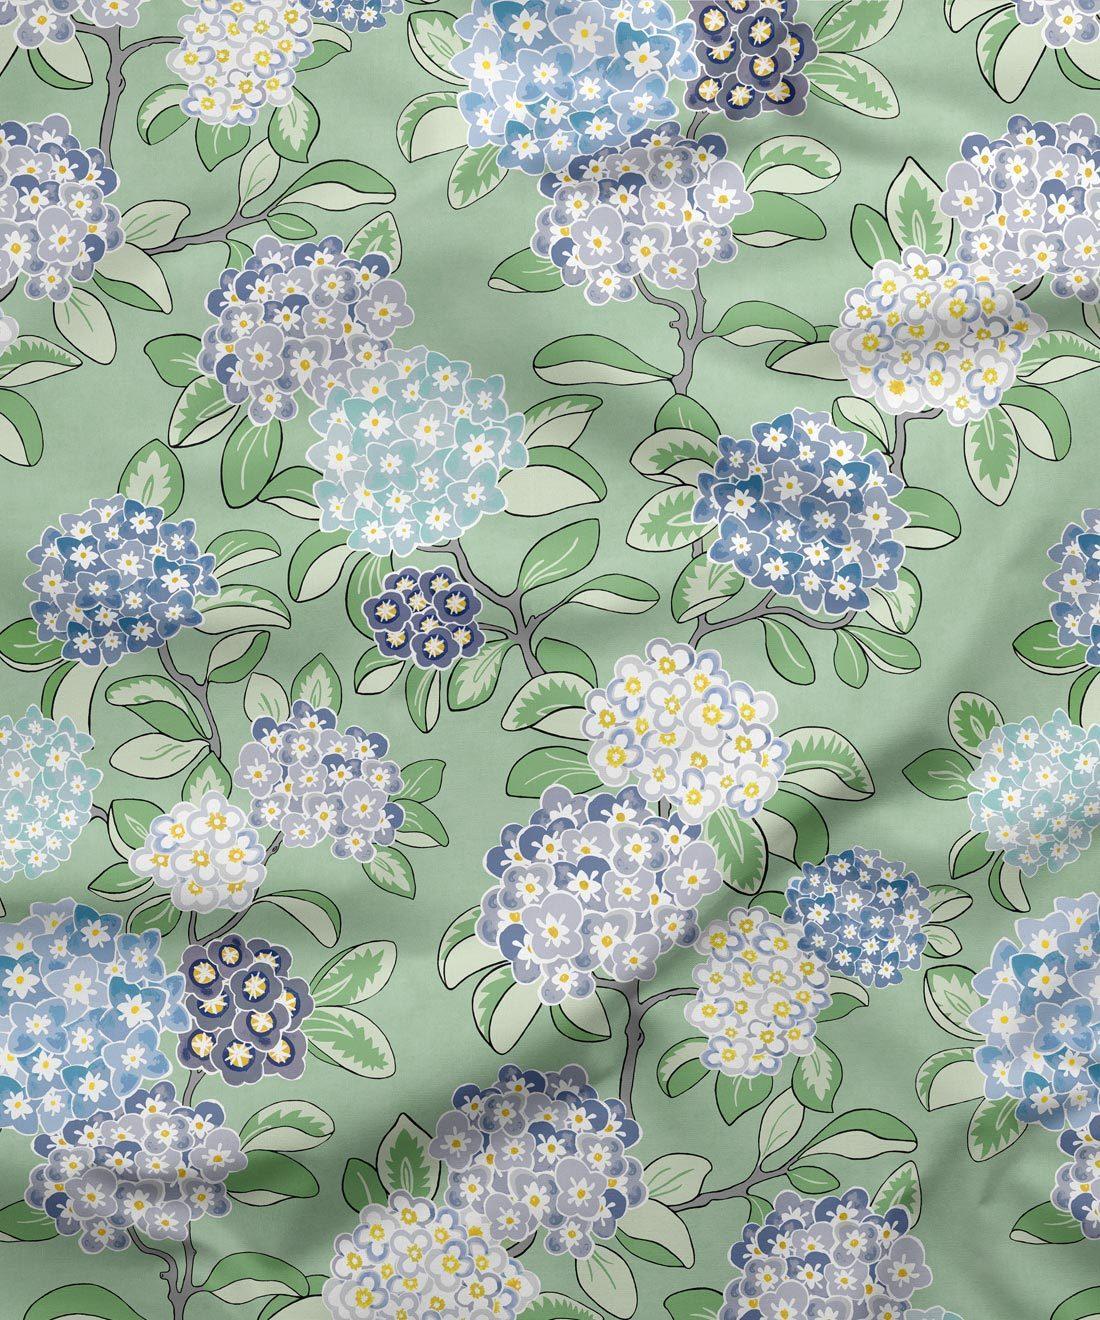 Hydrangea Fabric Green